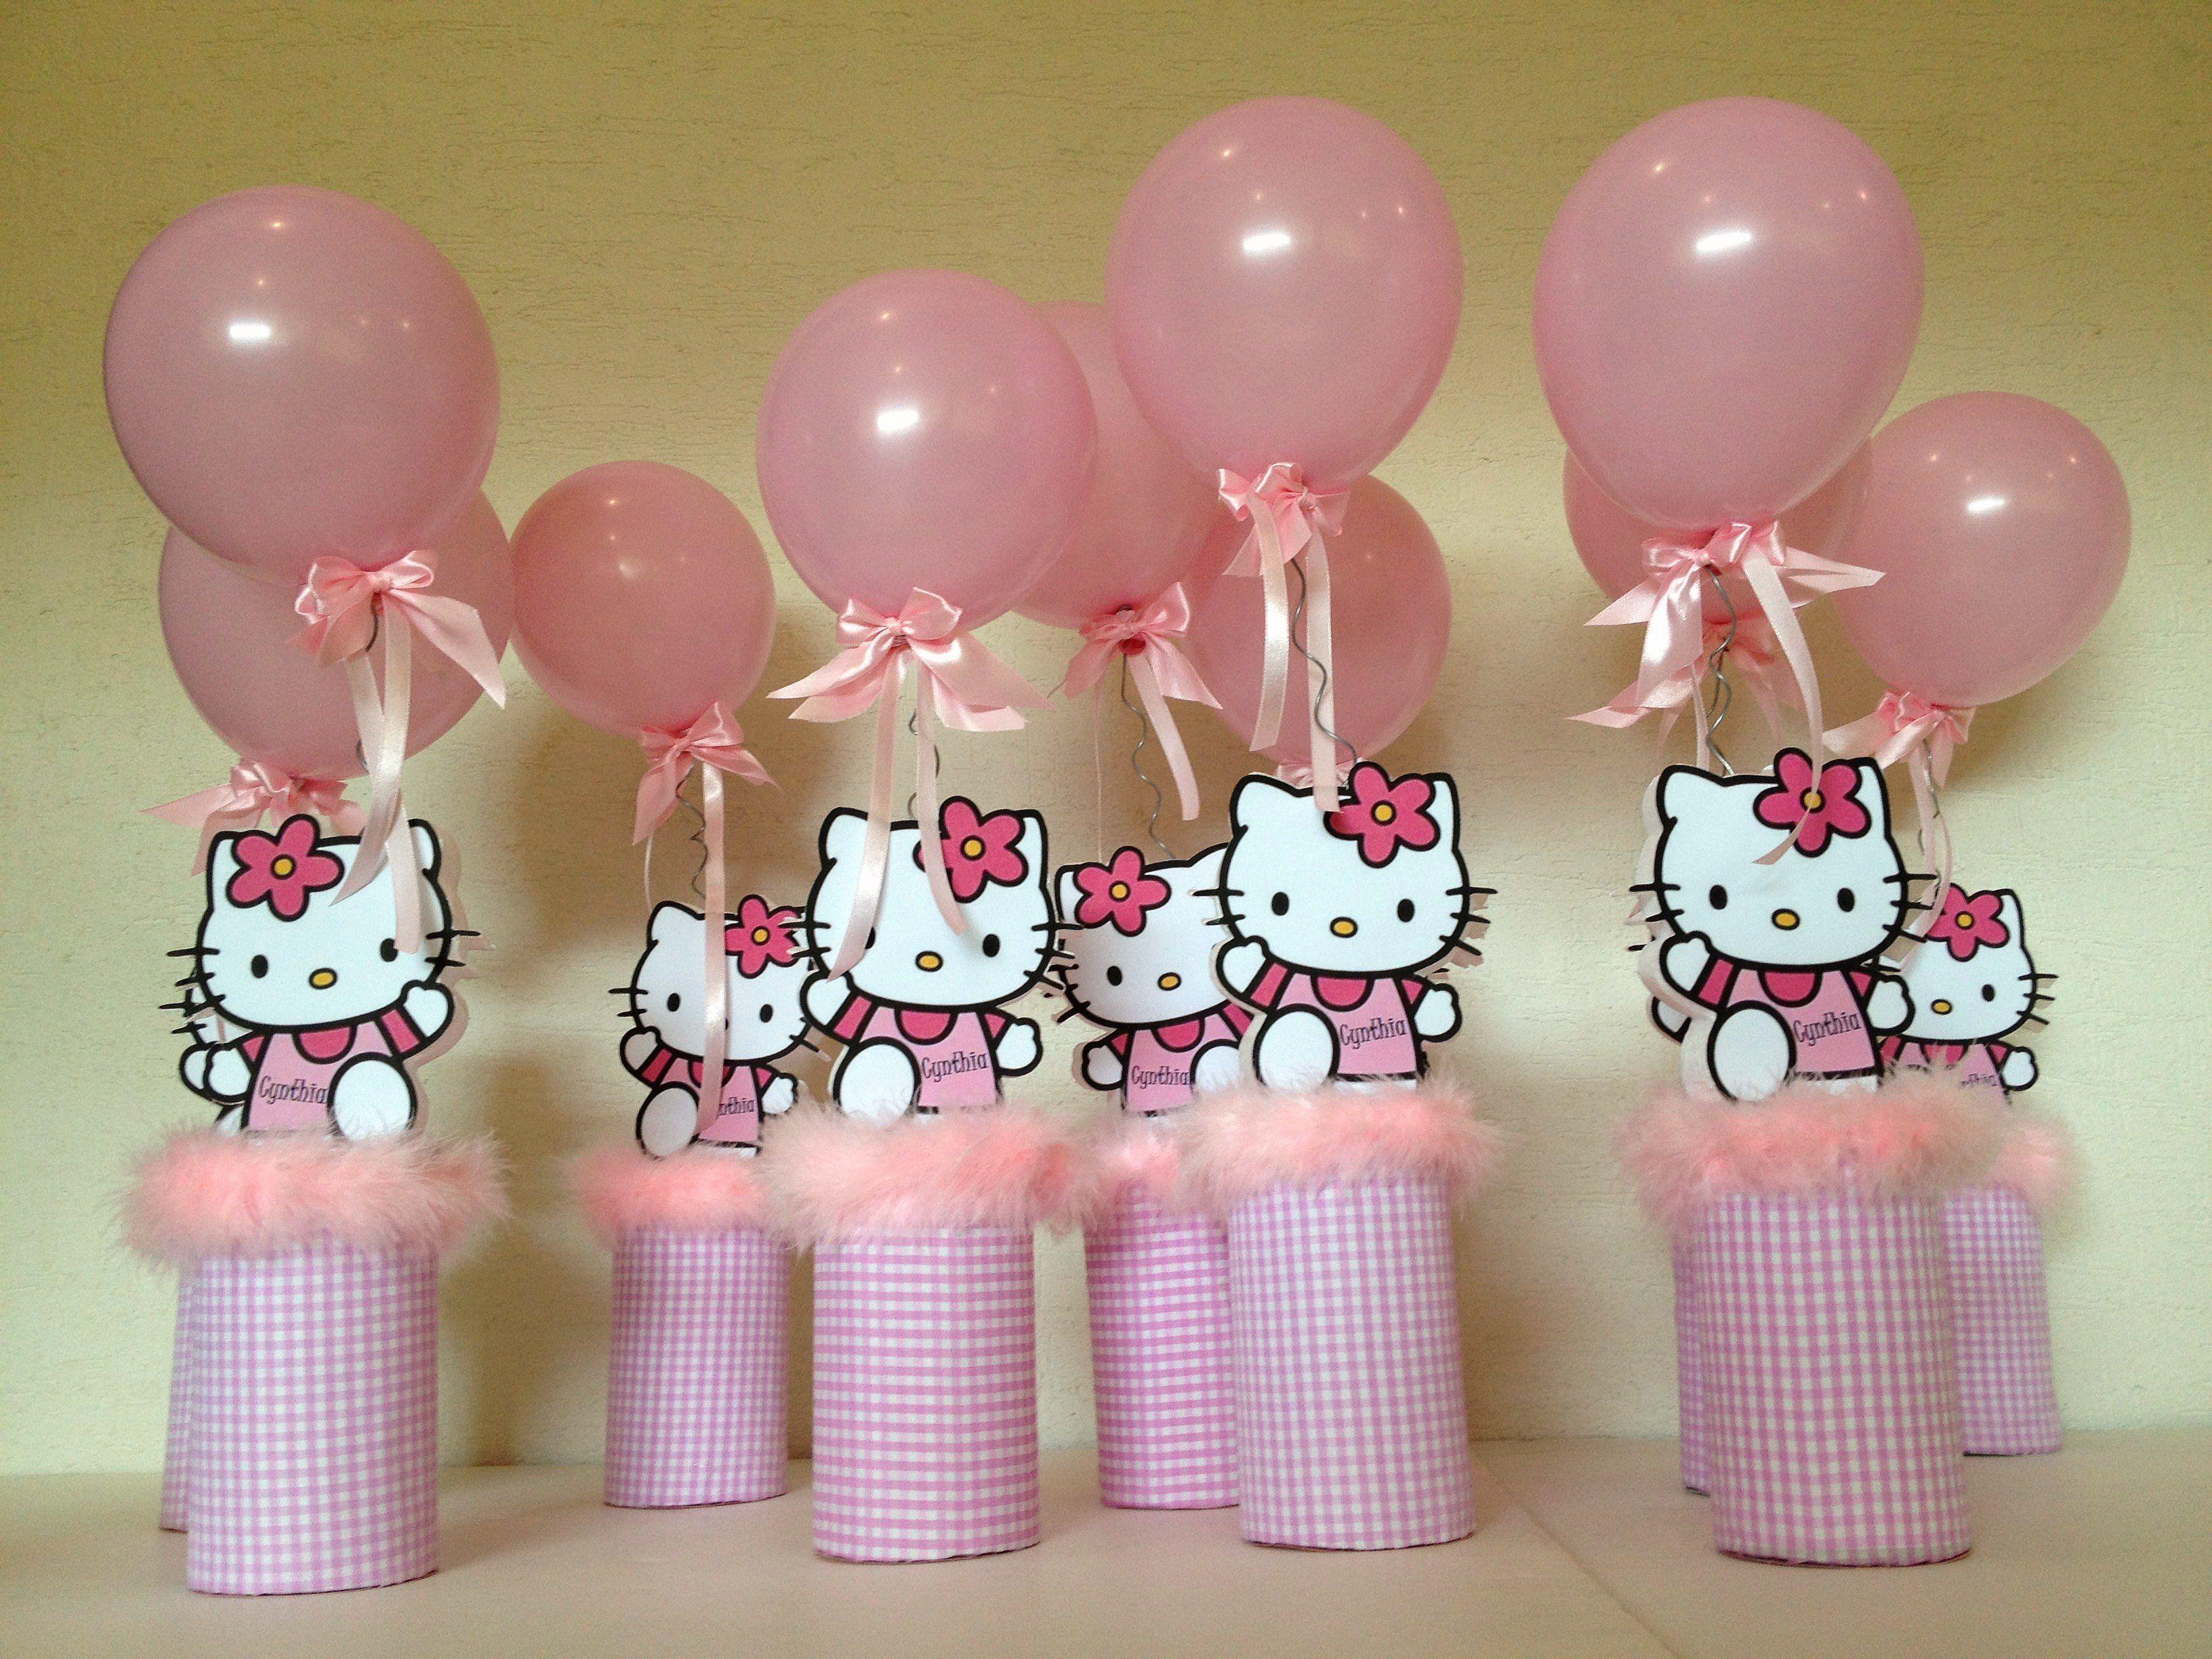 hello kitty baby shower decorations | Cumpleaños Fiesta Infantil Hello Kitty  Centros De Mesa 1b0kla (Otros .